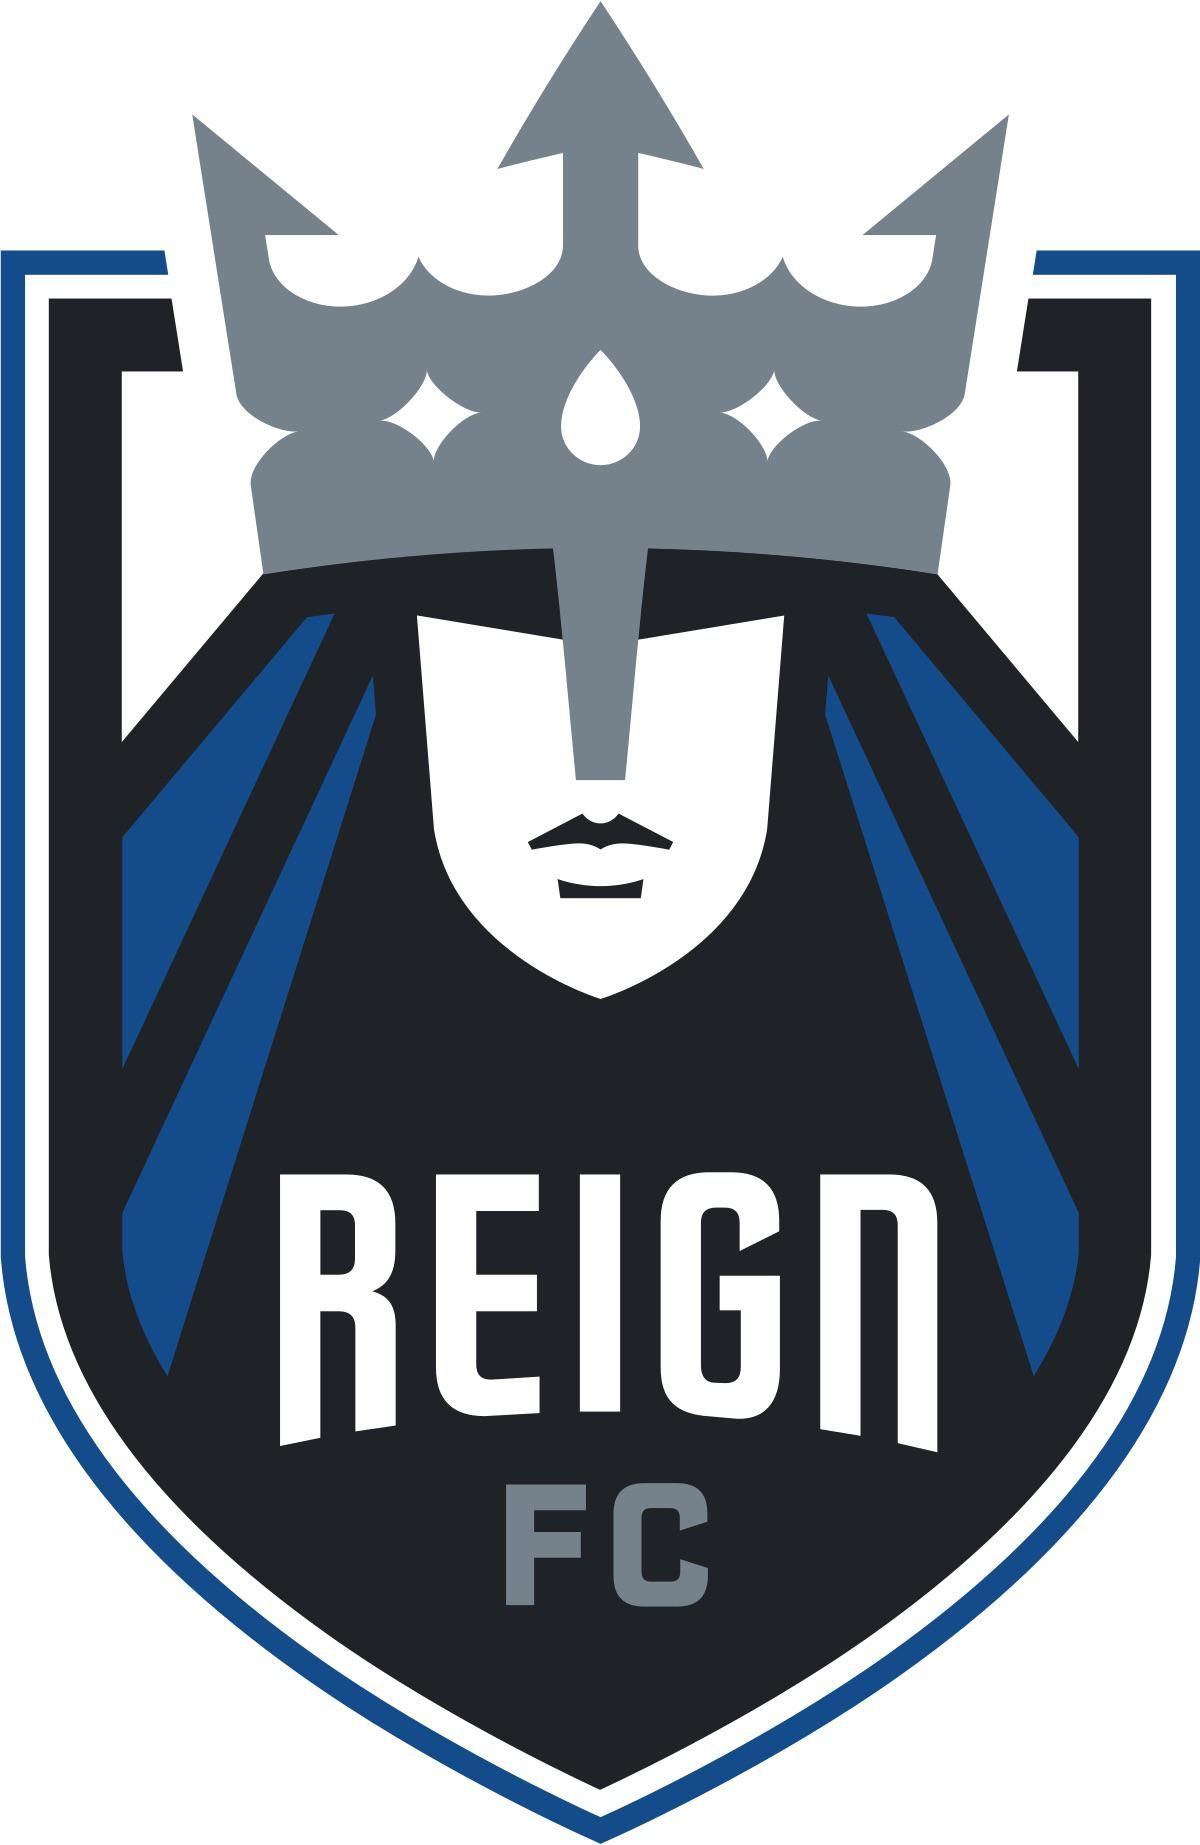 Reign Fcs Logo Simple Yet Elegant Sports Logo Design Sports Logo Soccer Logo